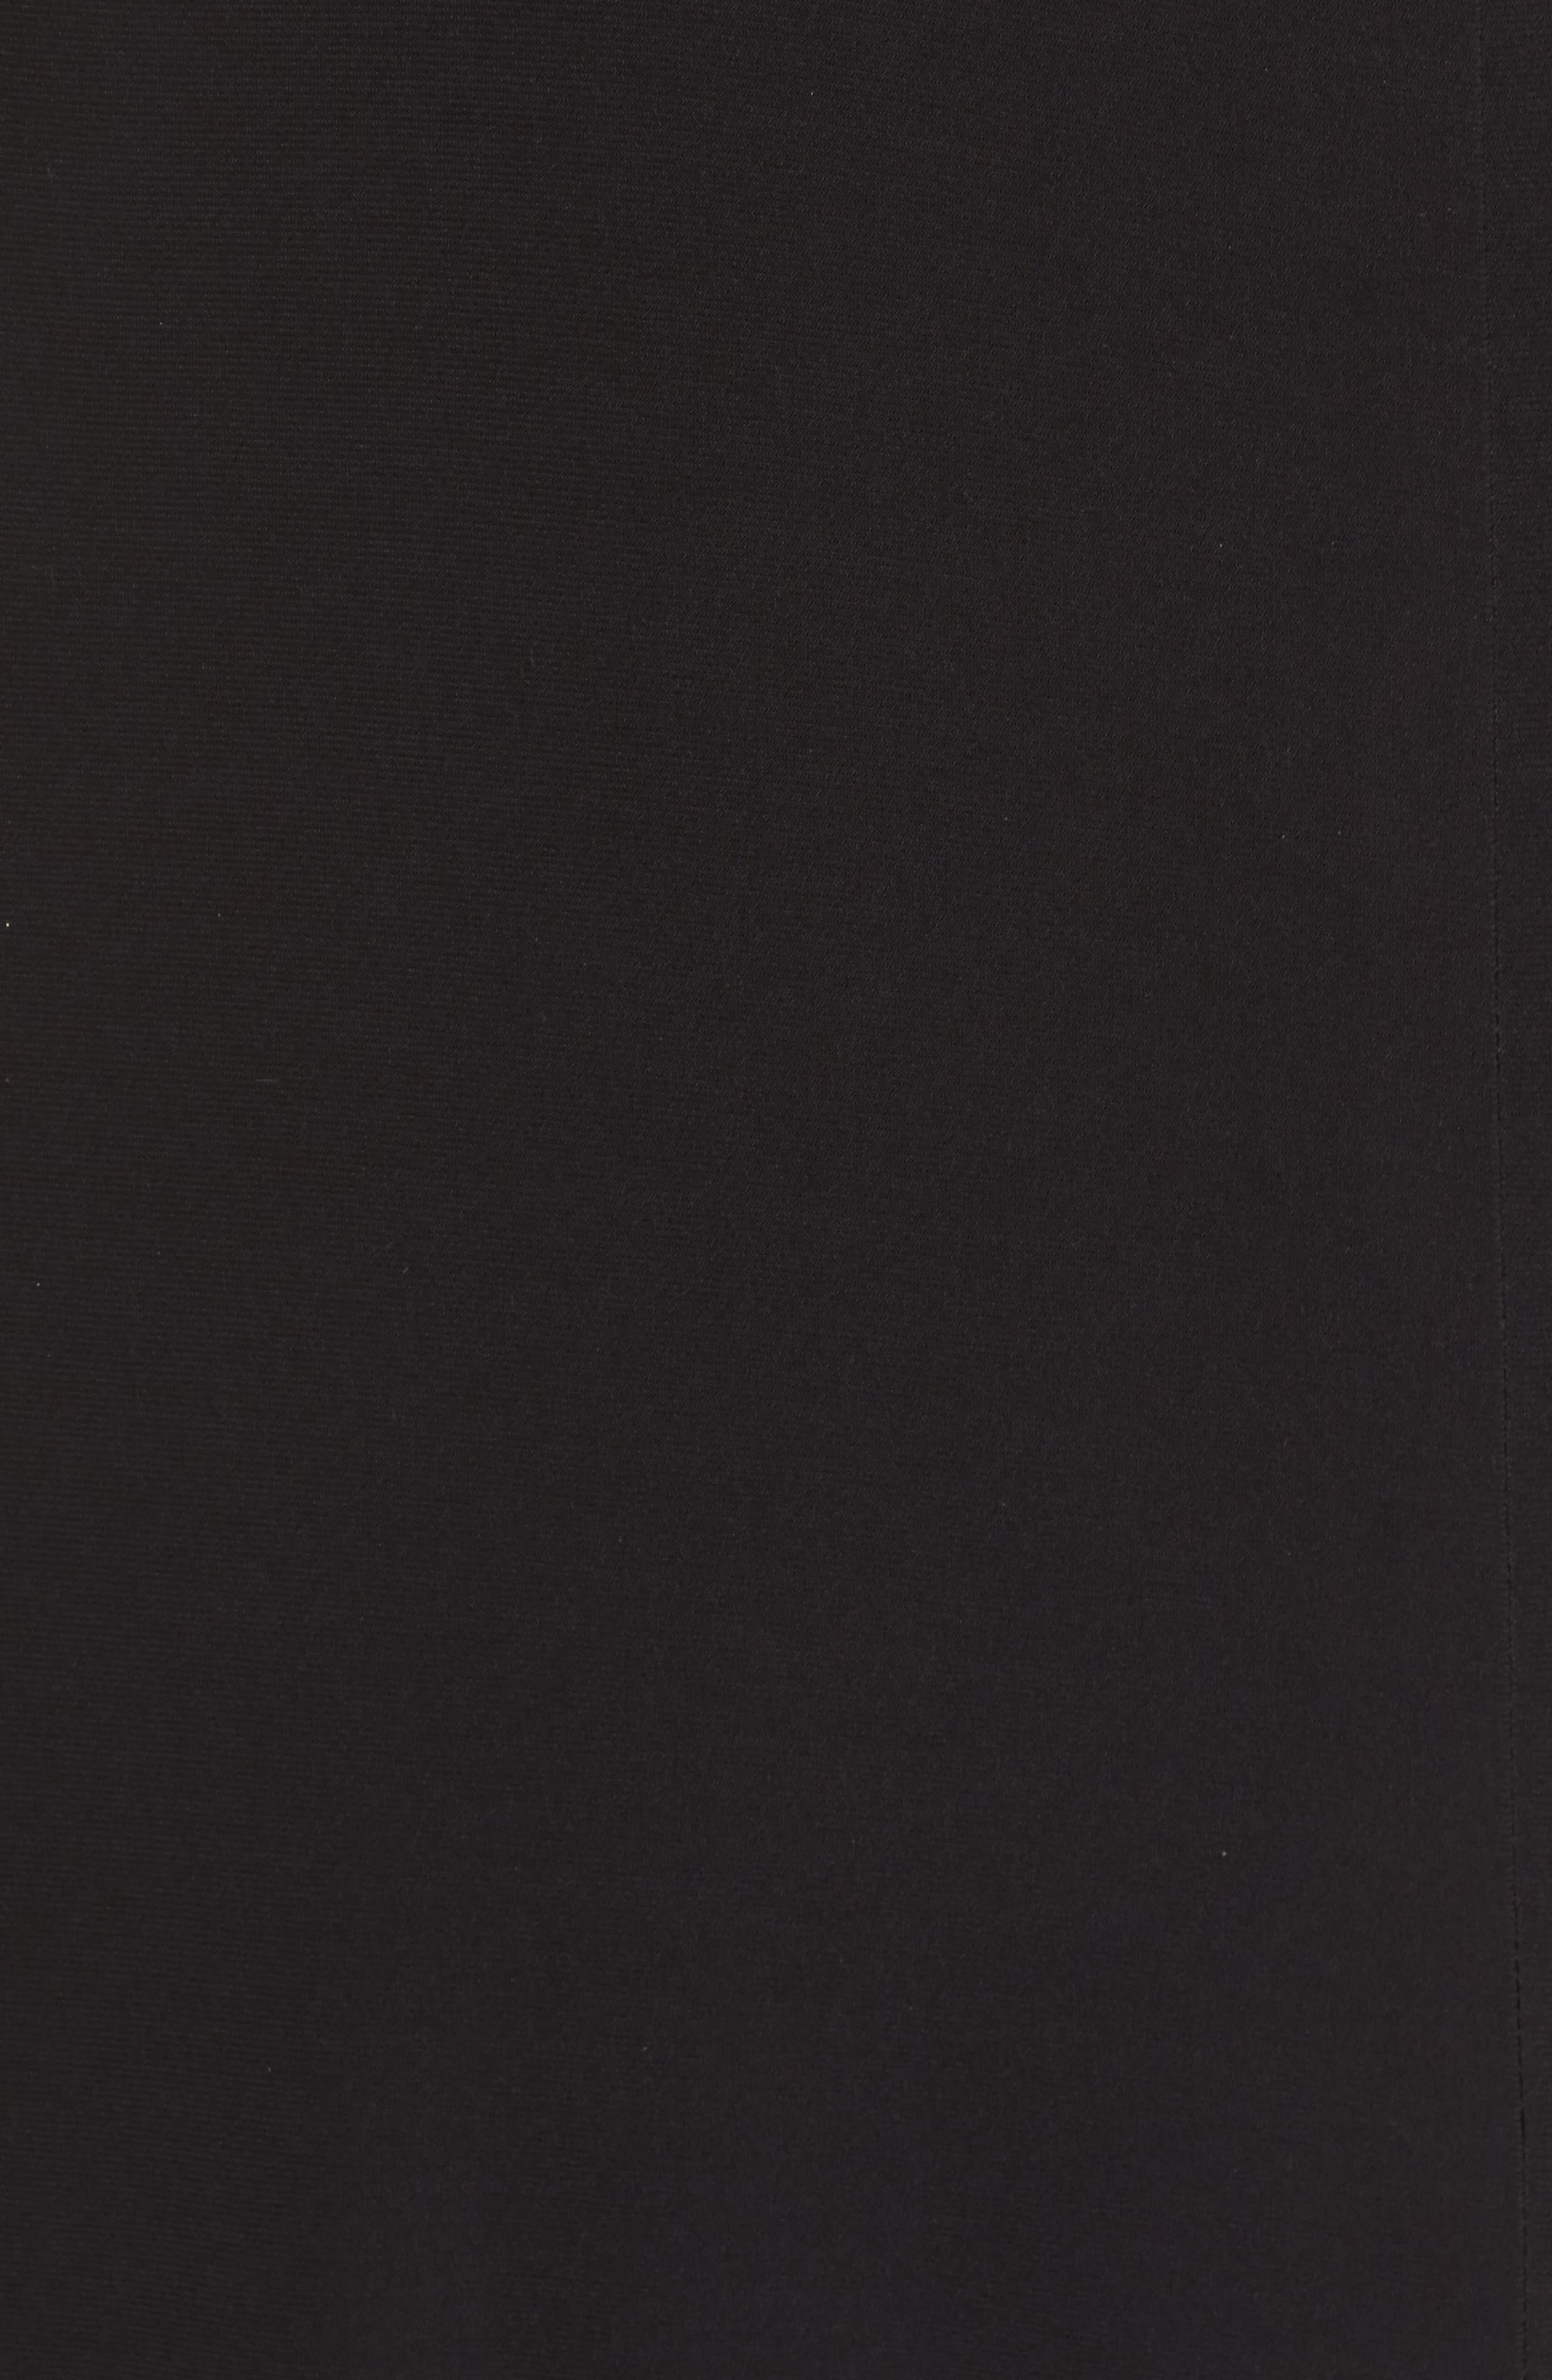 Sequin Mesh Panel Gown,                             Alternate thumbnail 5, color,                             Black / Rose Gold